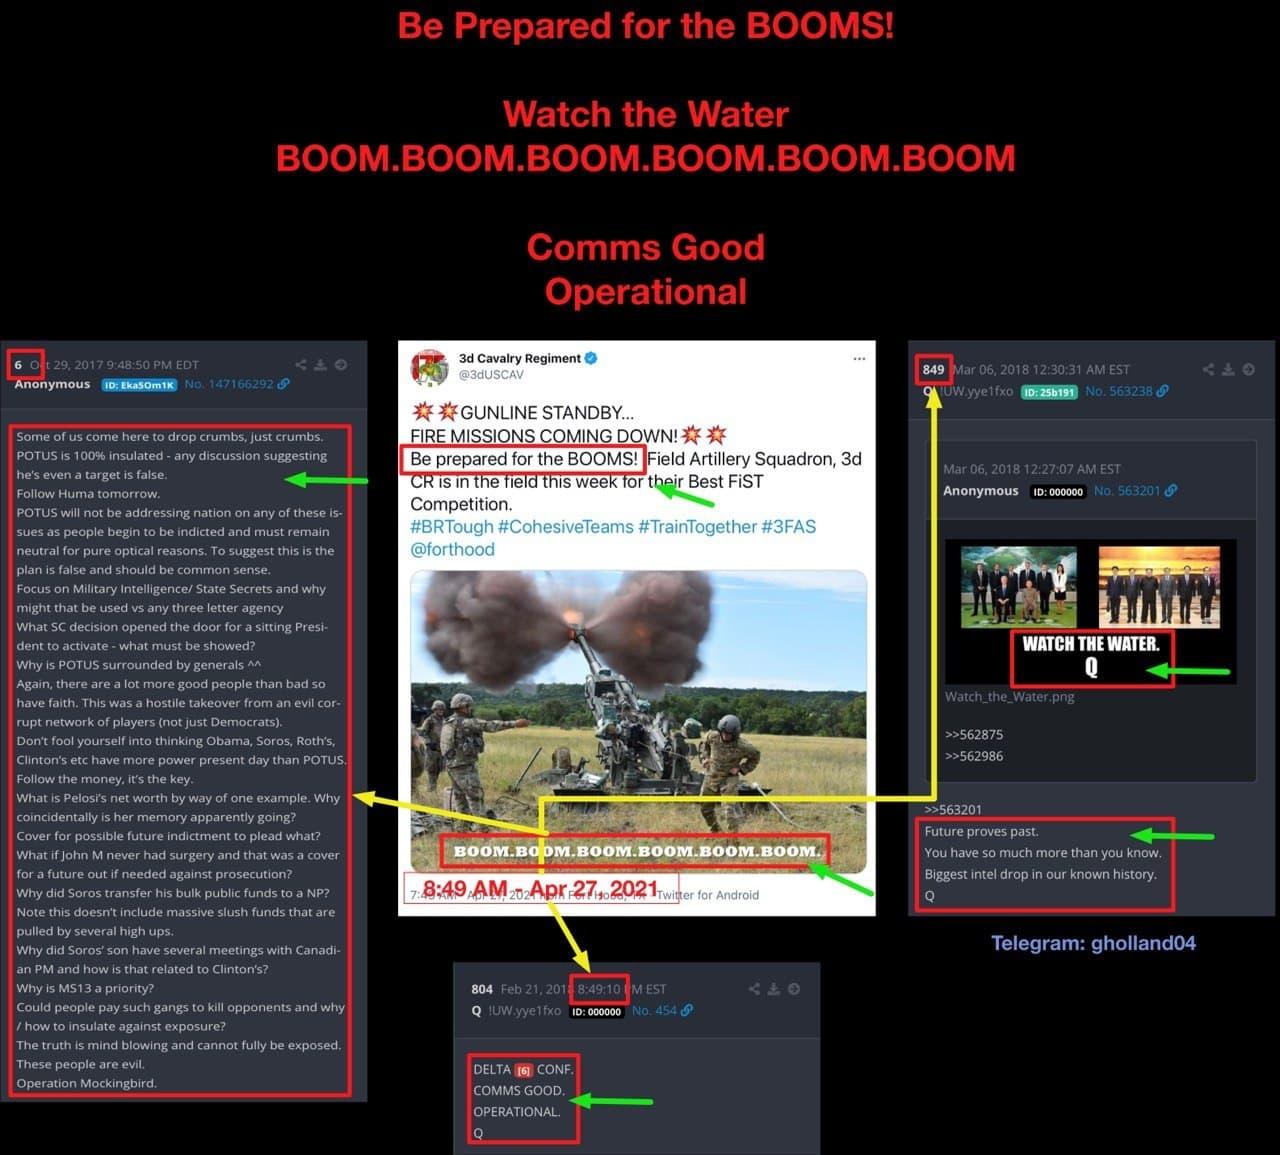 BOOM BOOM BOOM _2021-04-27_17-30-39.jpg